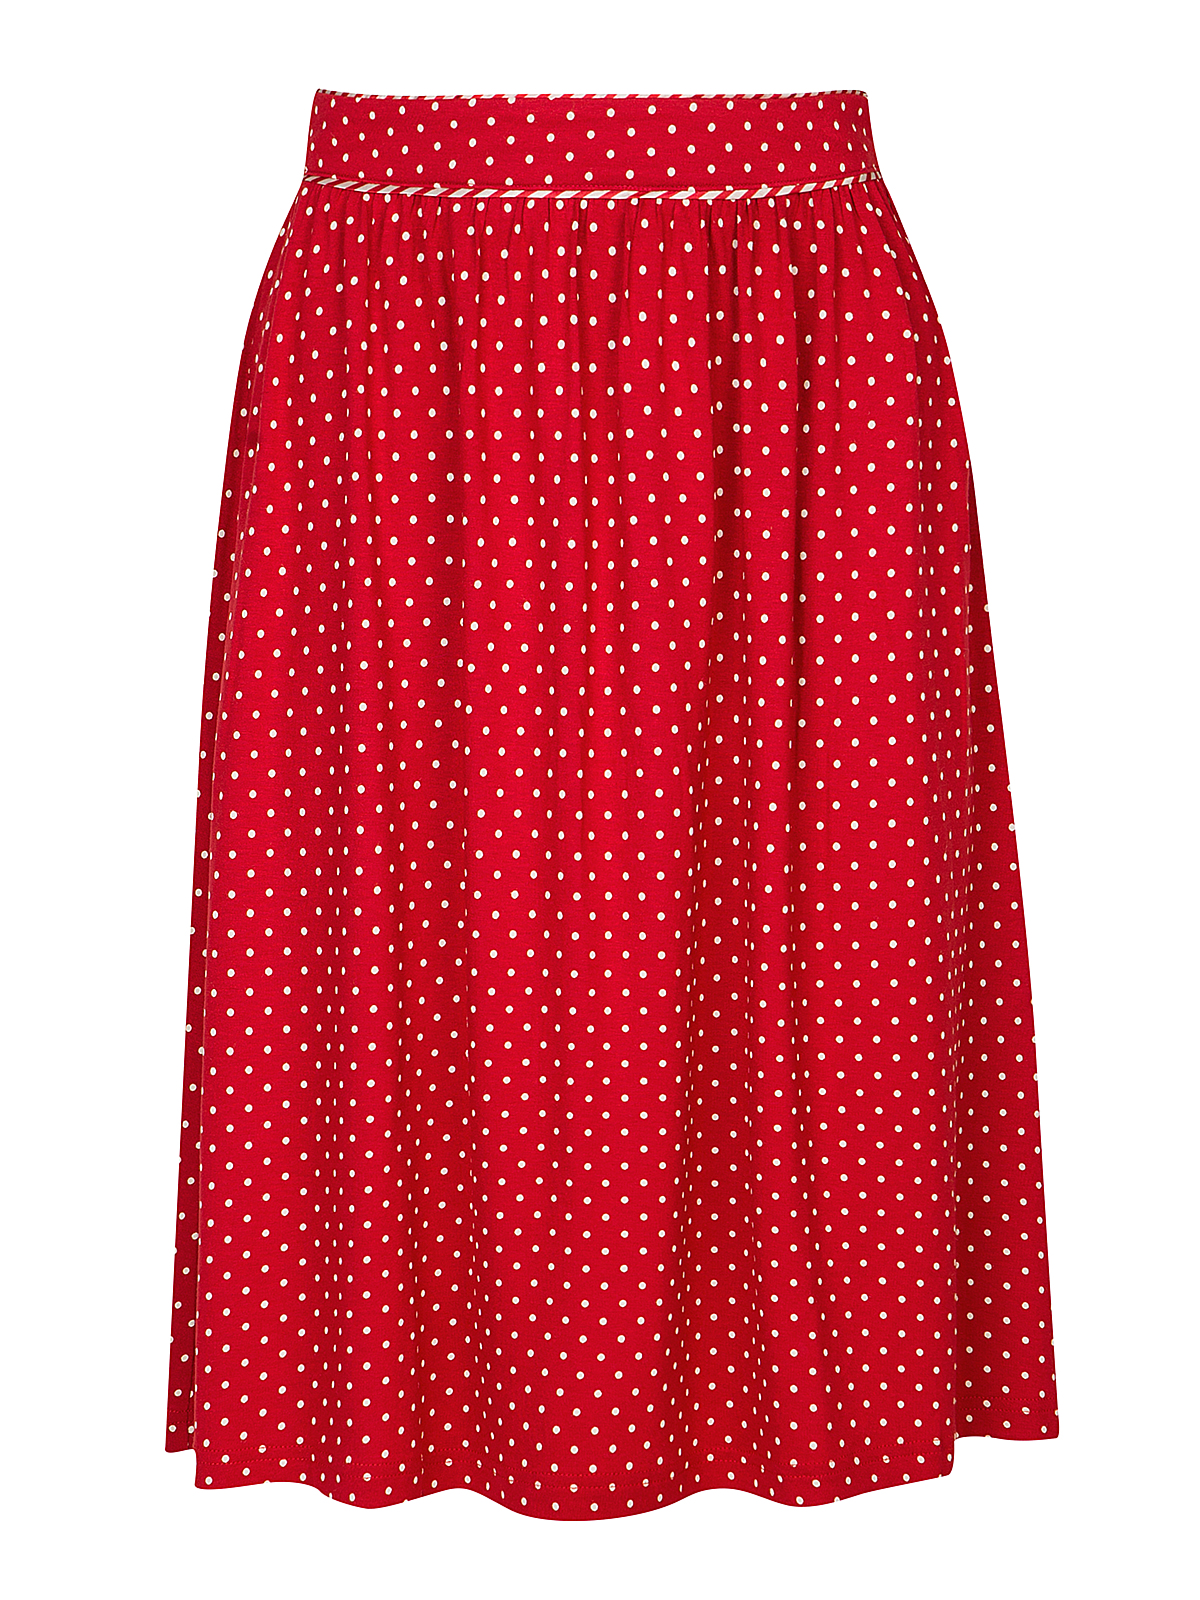 Roecke - Vive Maria Monaco Skirt Red Allover – Größe XL  - Onlineshop NAPO Shop